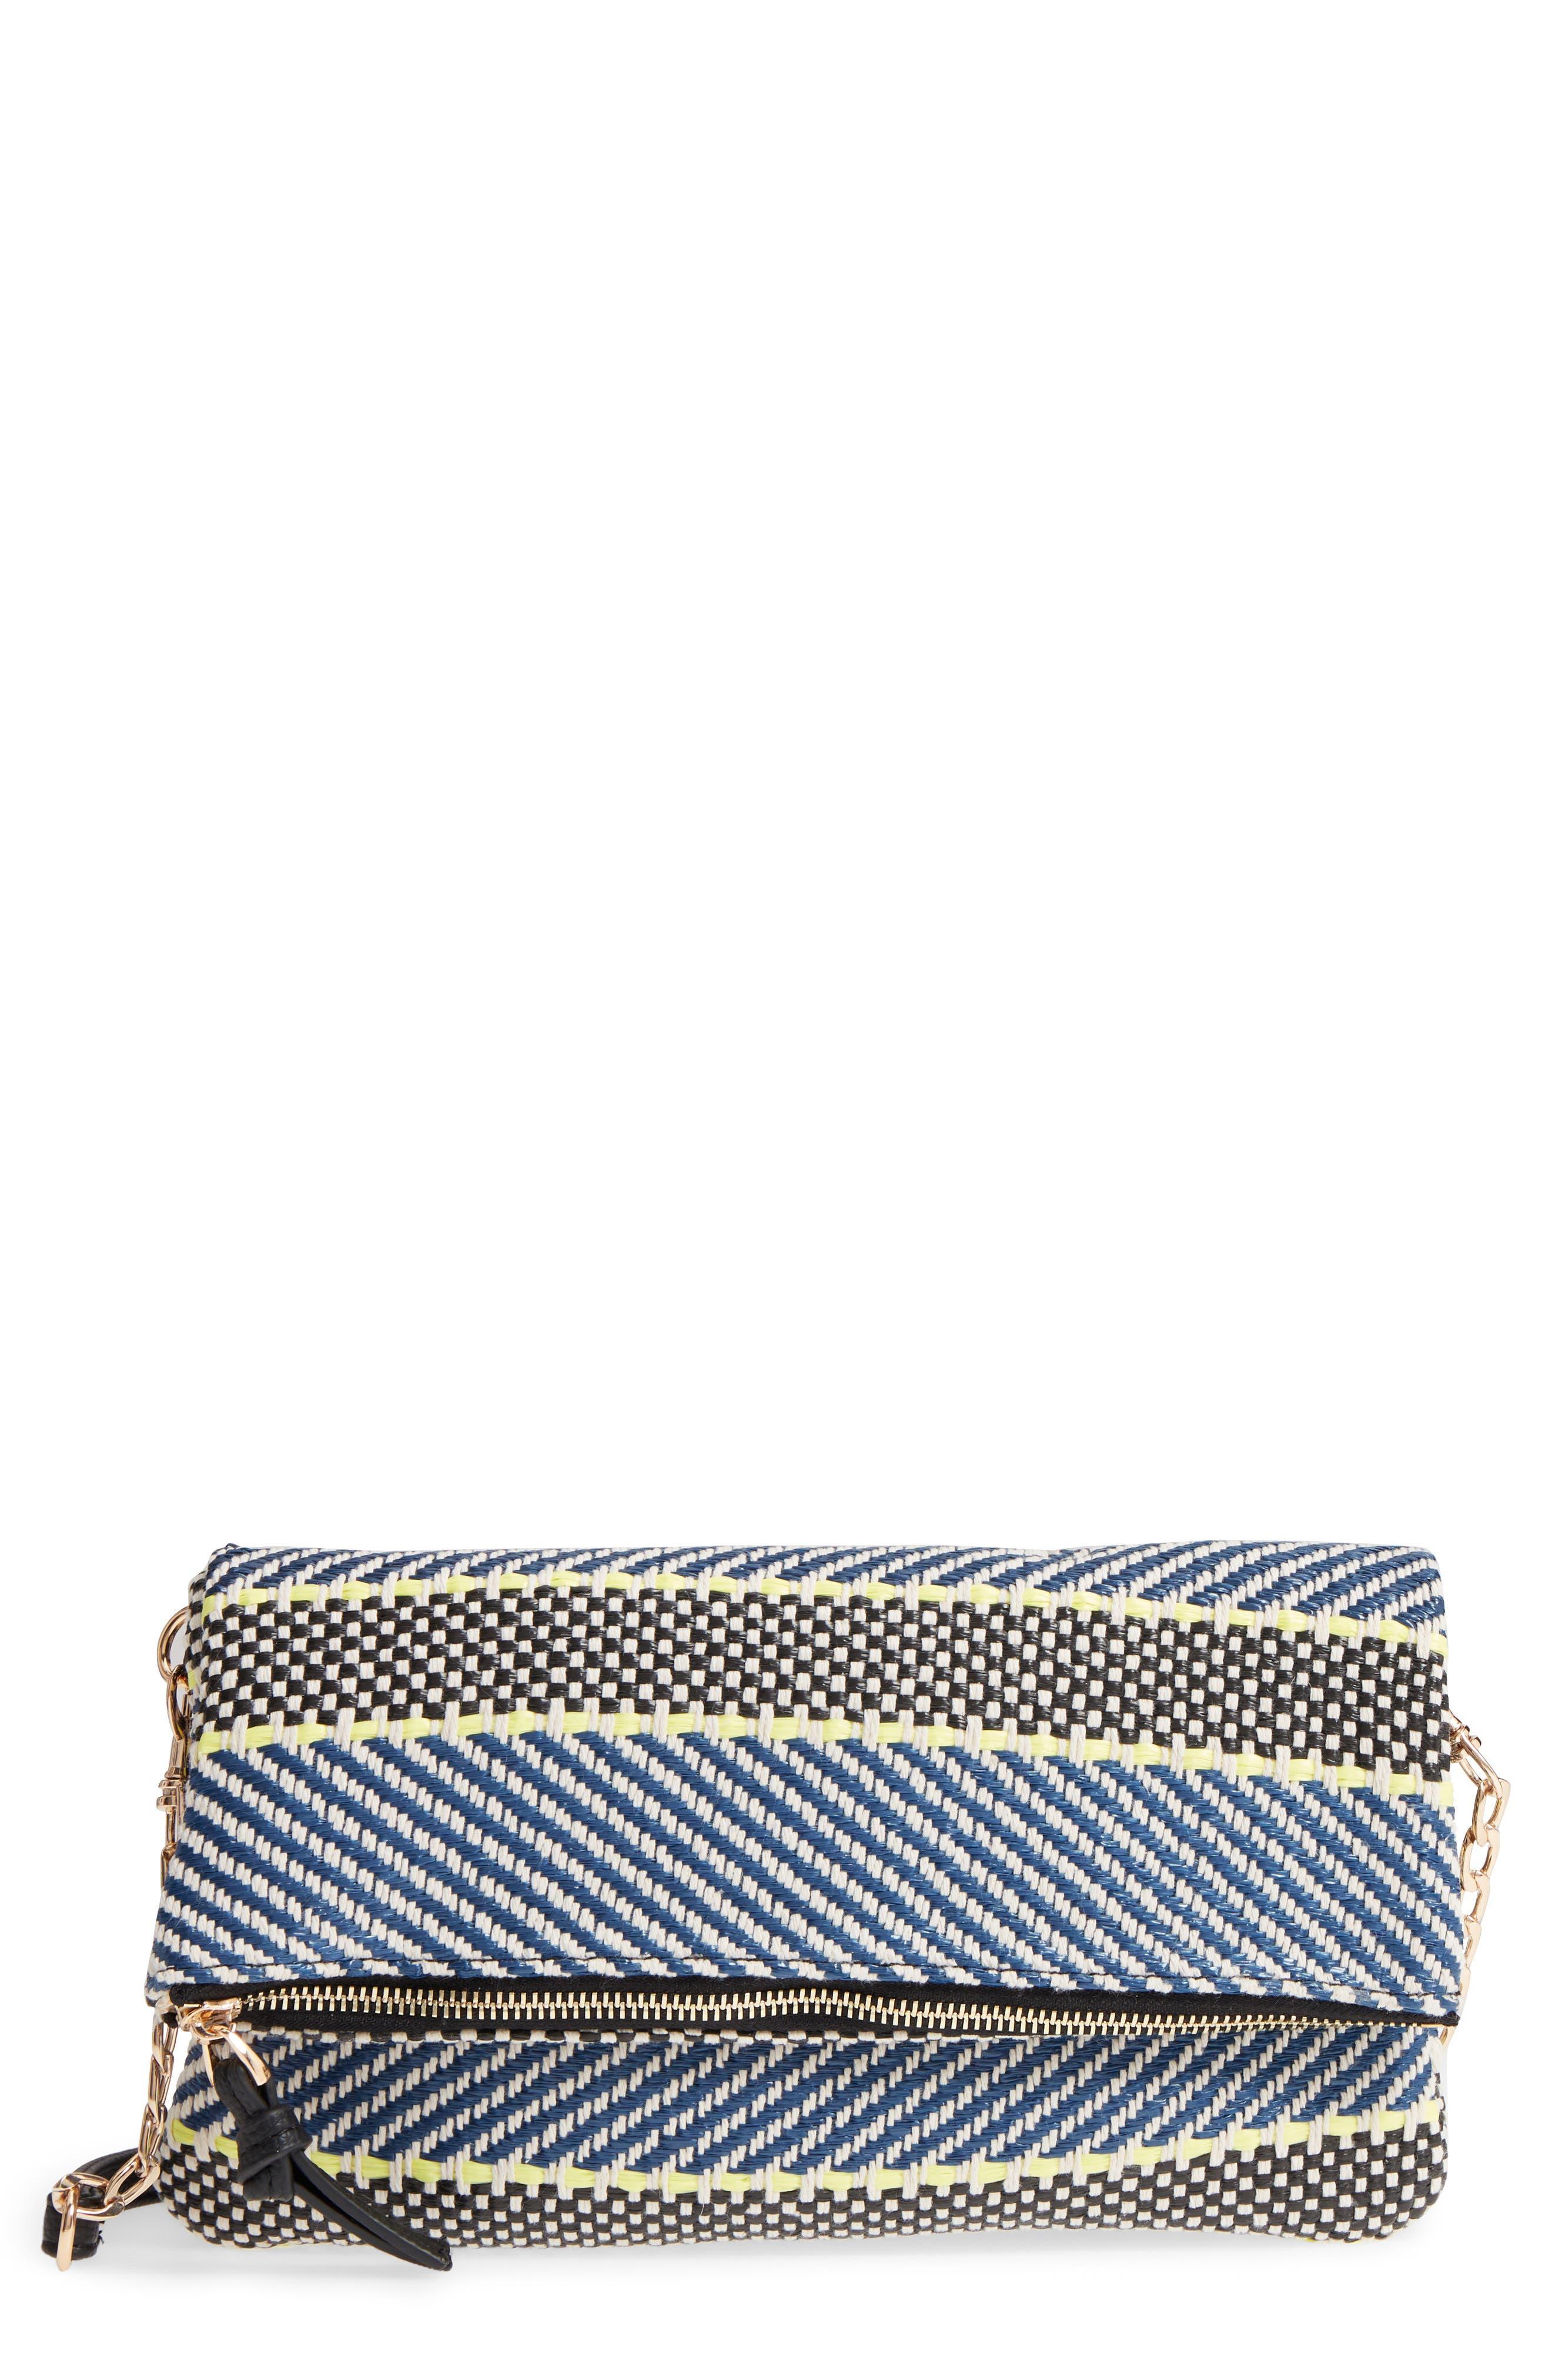 Medina Fabric Foldover Clutch,                         Main,                         color, Navy/ Cream Combo